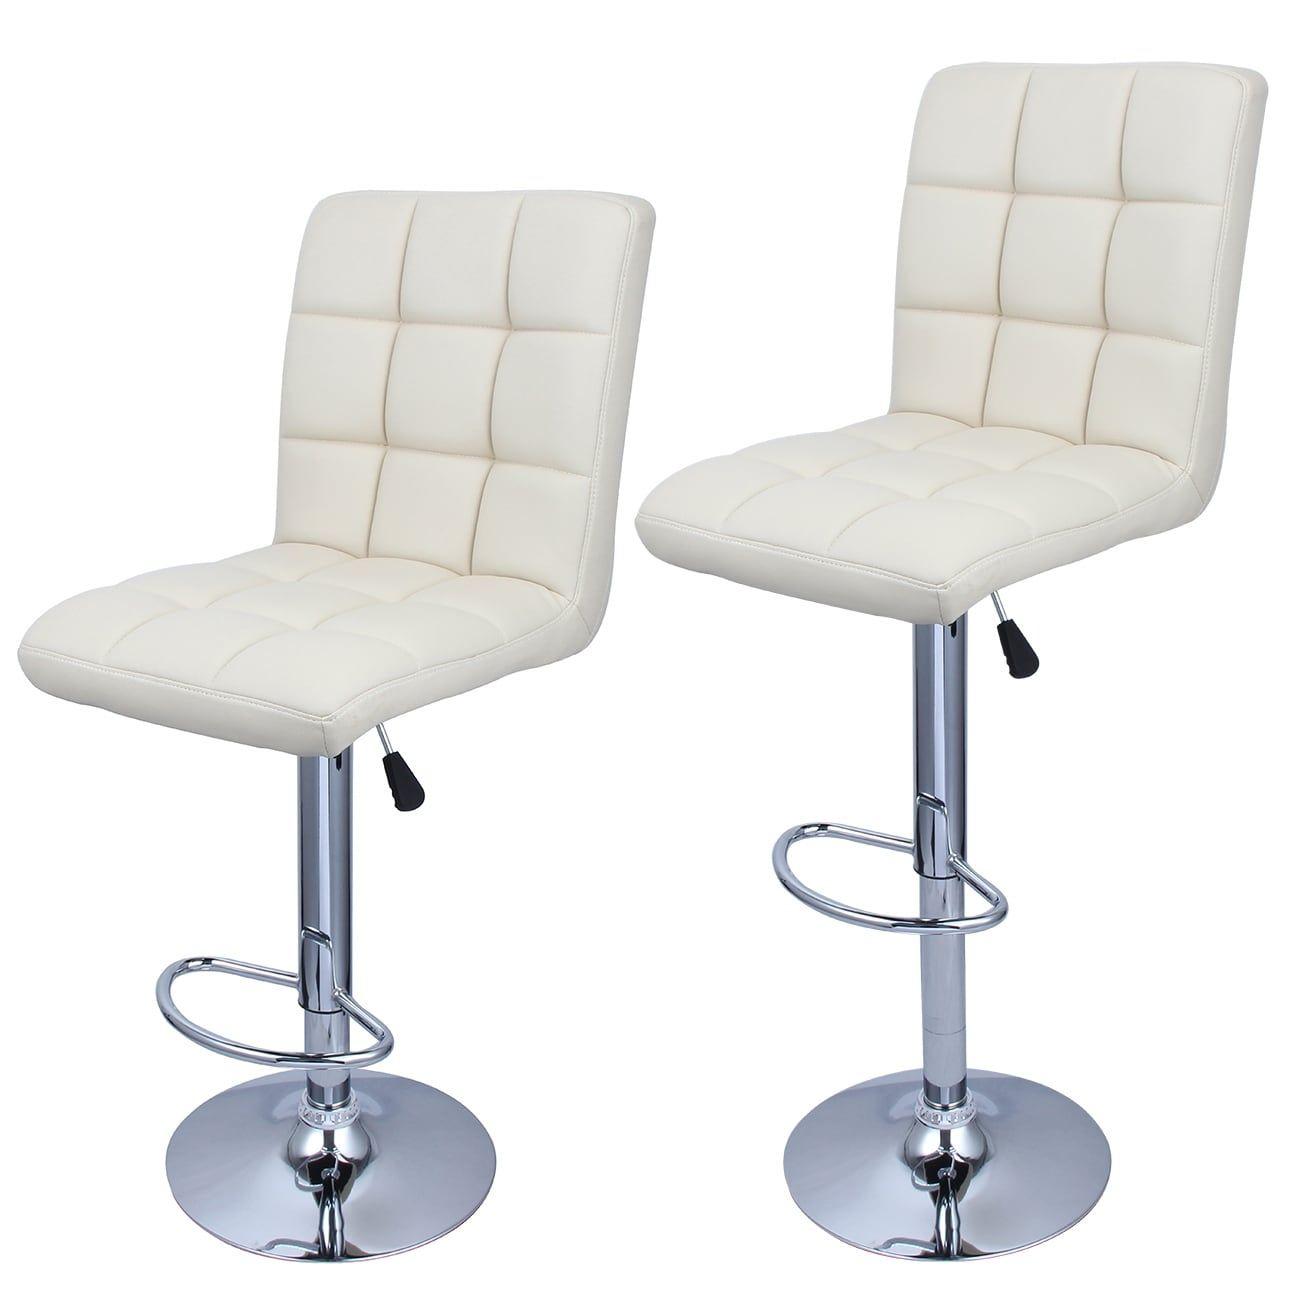 Groovy Belleze Swivel Leather Adjustable Hydraulic Bar Stool Cream Machost Co Dining Chair Design Ideas Machostcouk